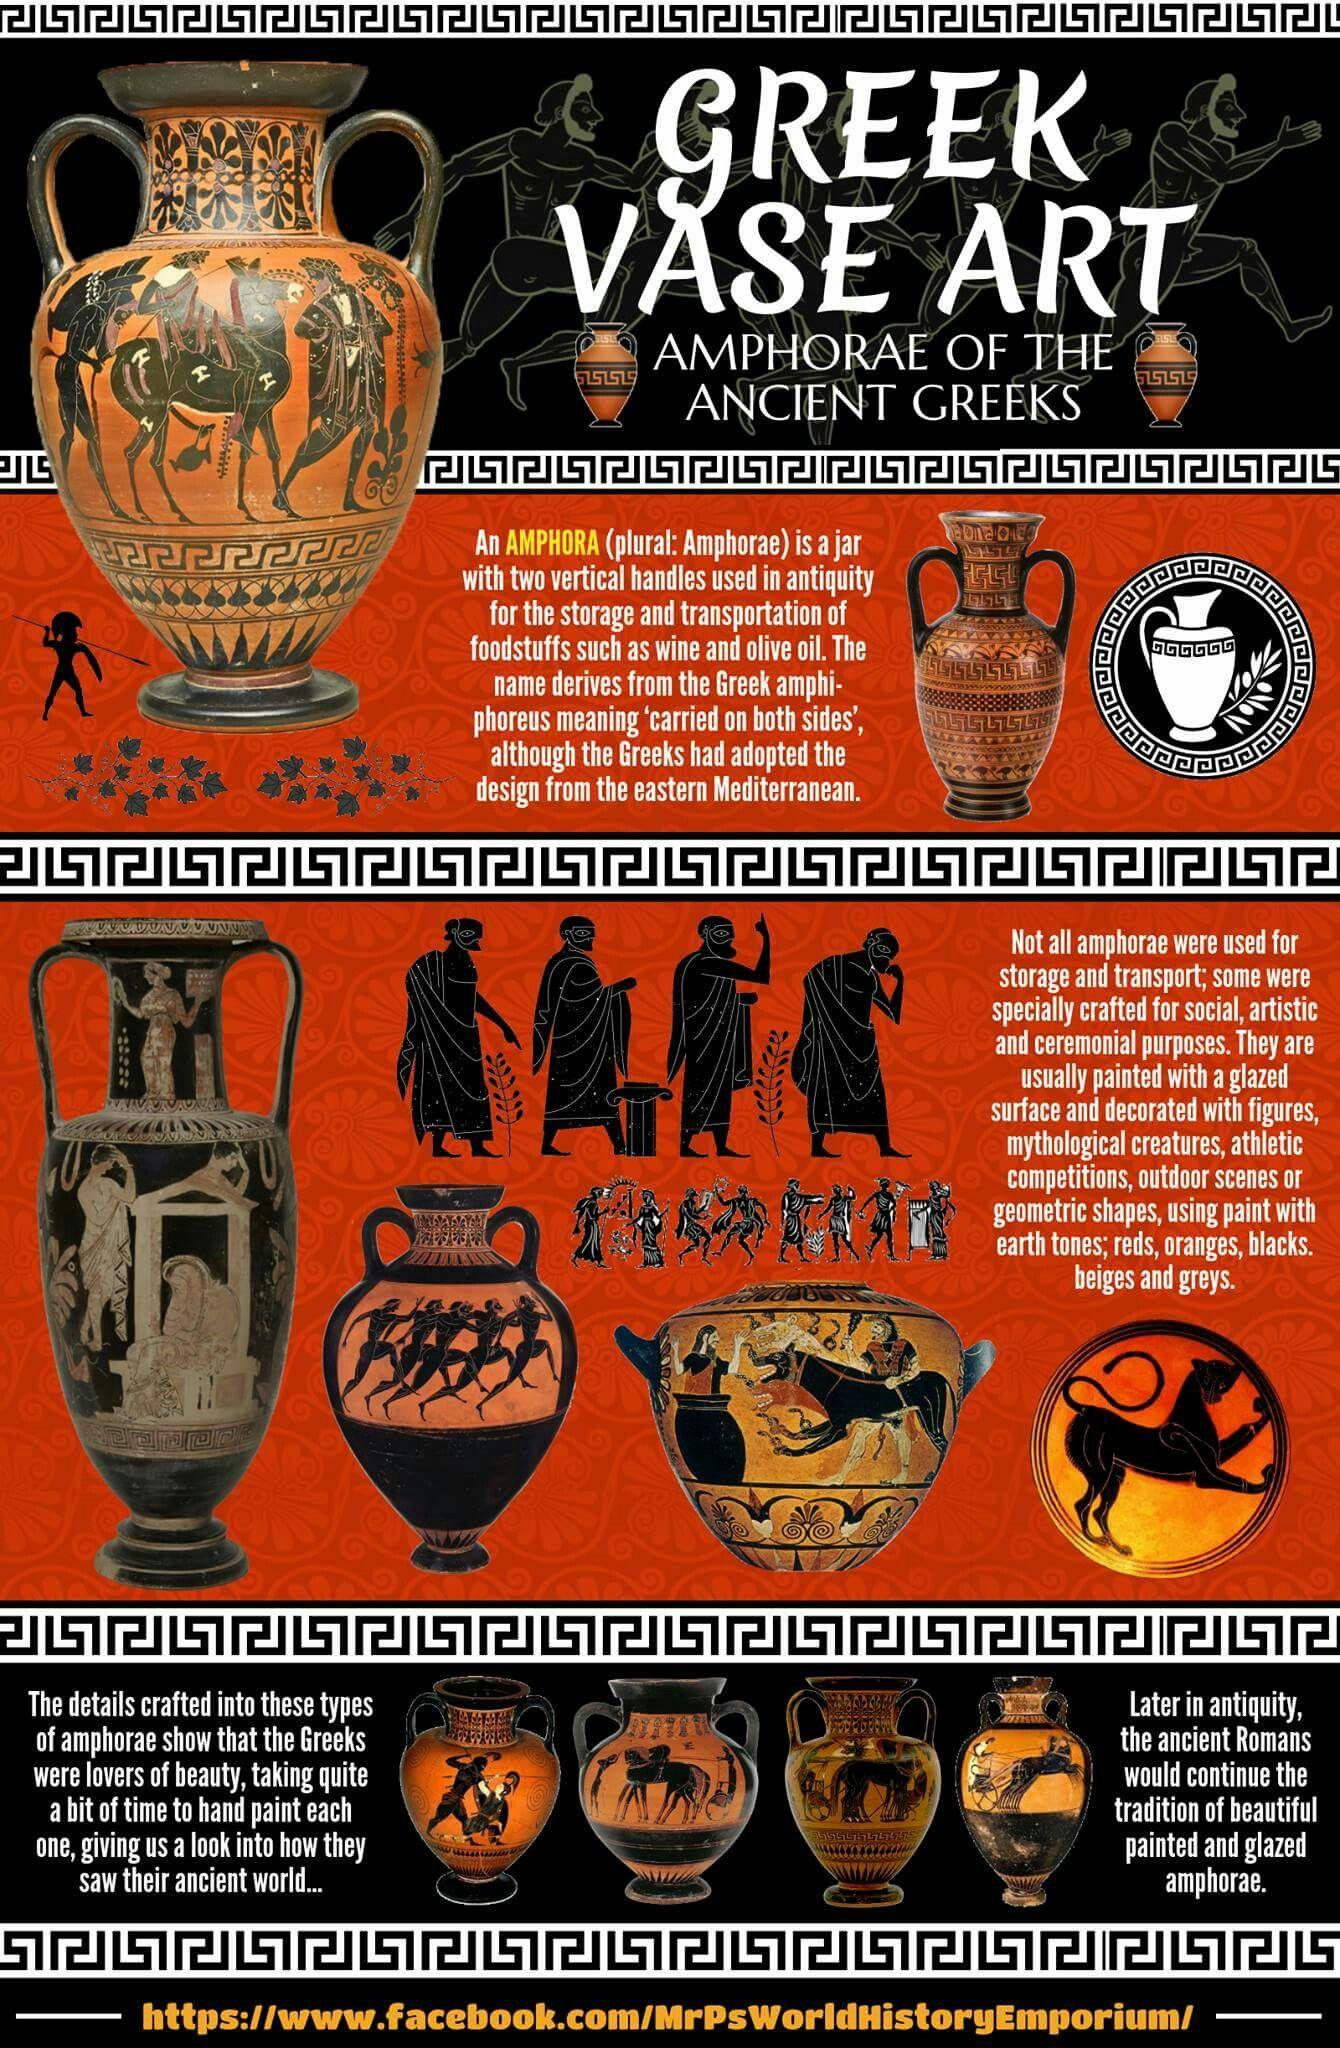 Https M Facebook Com Story Php Story Fbid 1451634858206568 Id 1142032539166803 Ancient Greece History Greek History Greece History